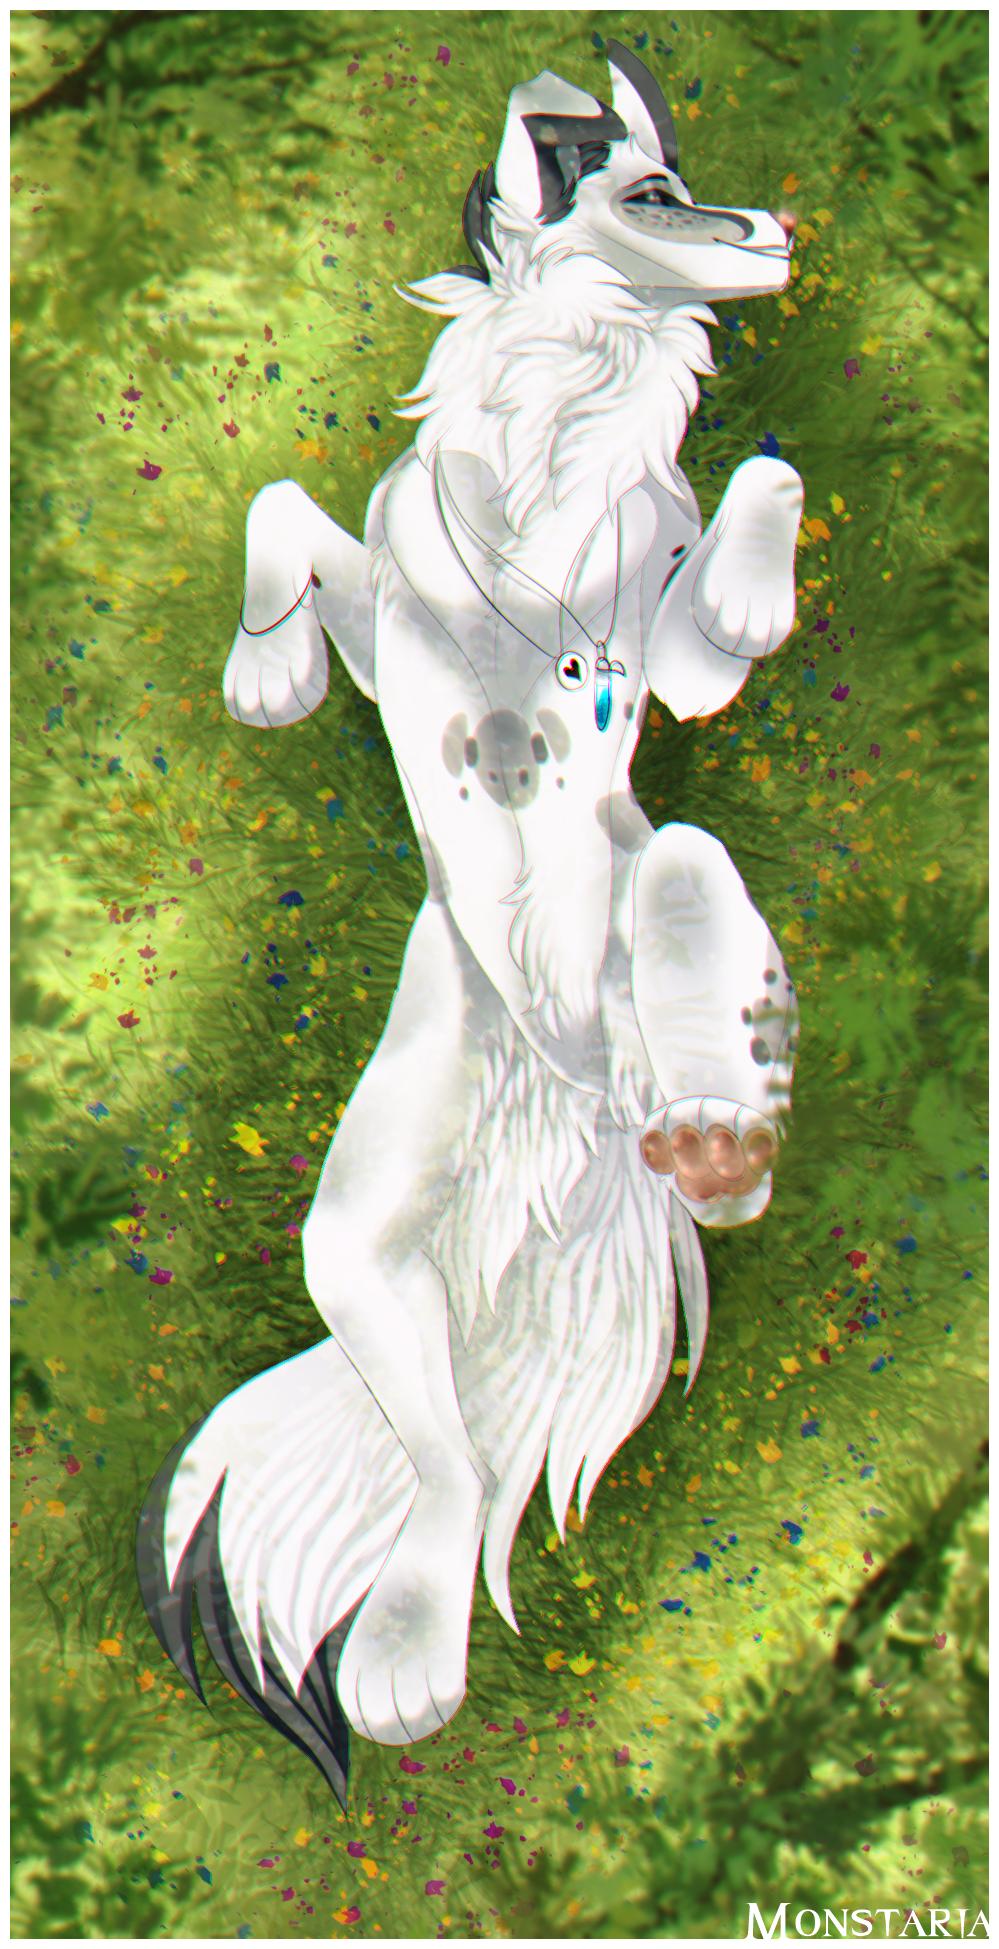 SkyWolff's Profile Picture